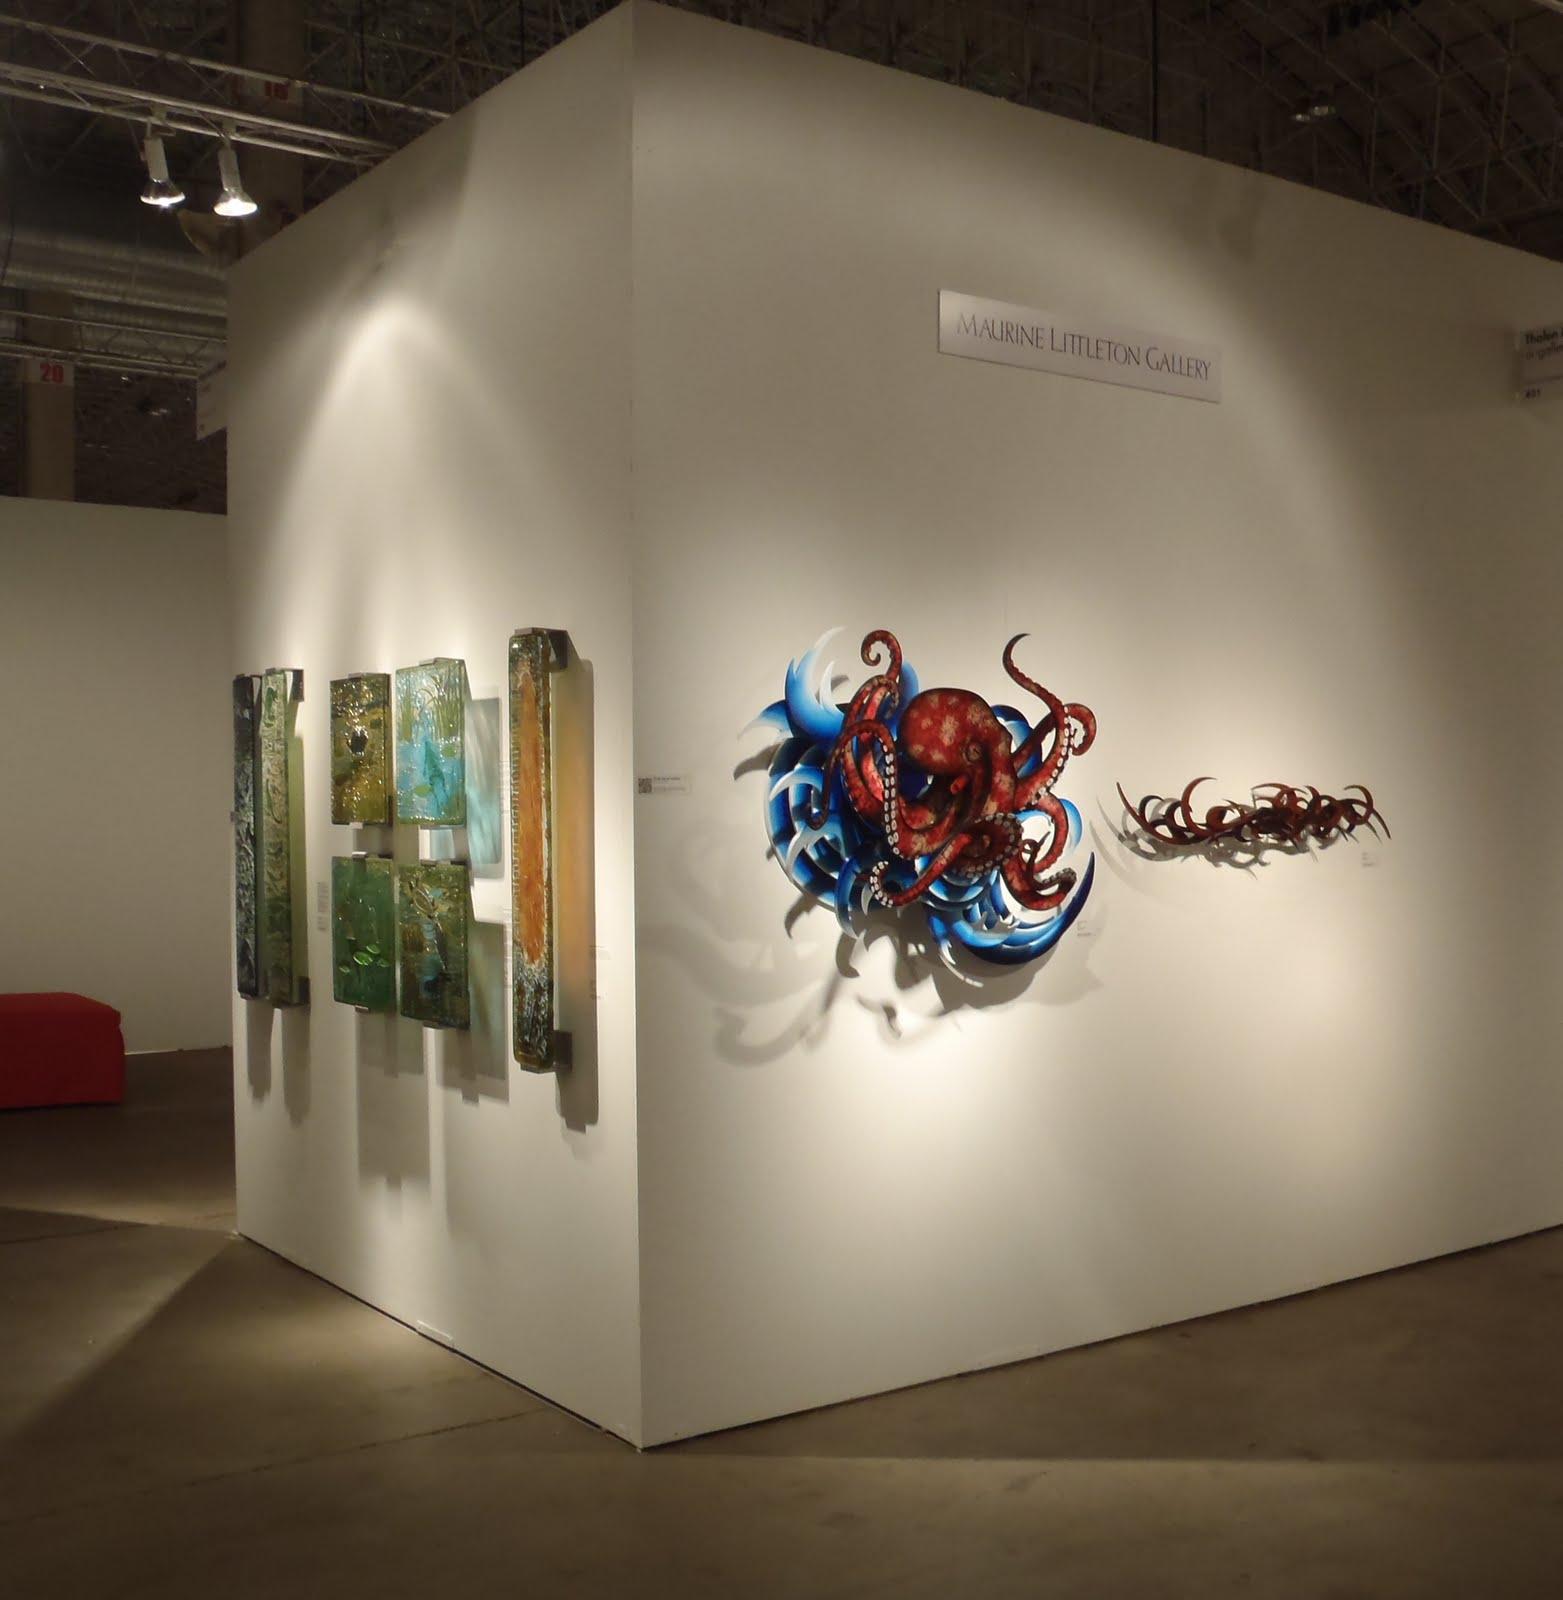 sofa chicago artists e colchoes mega tv washington glass school report from